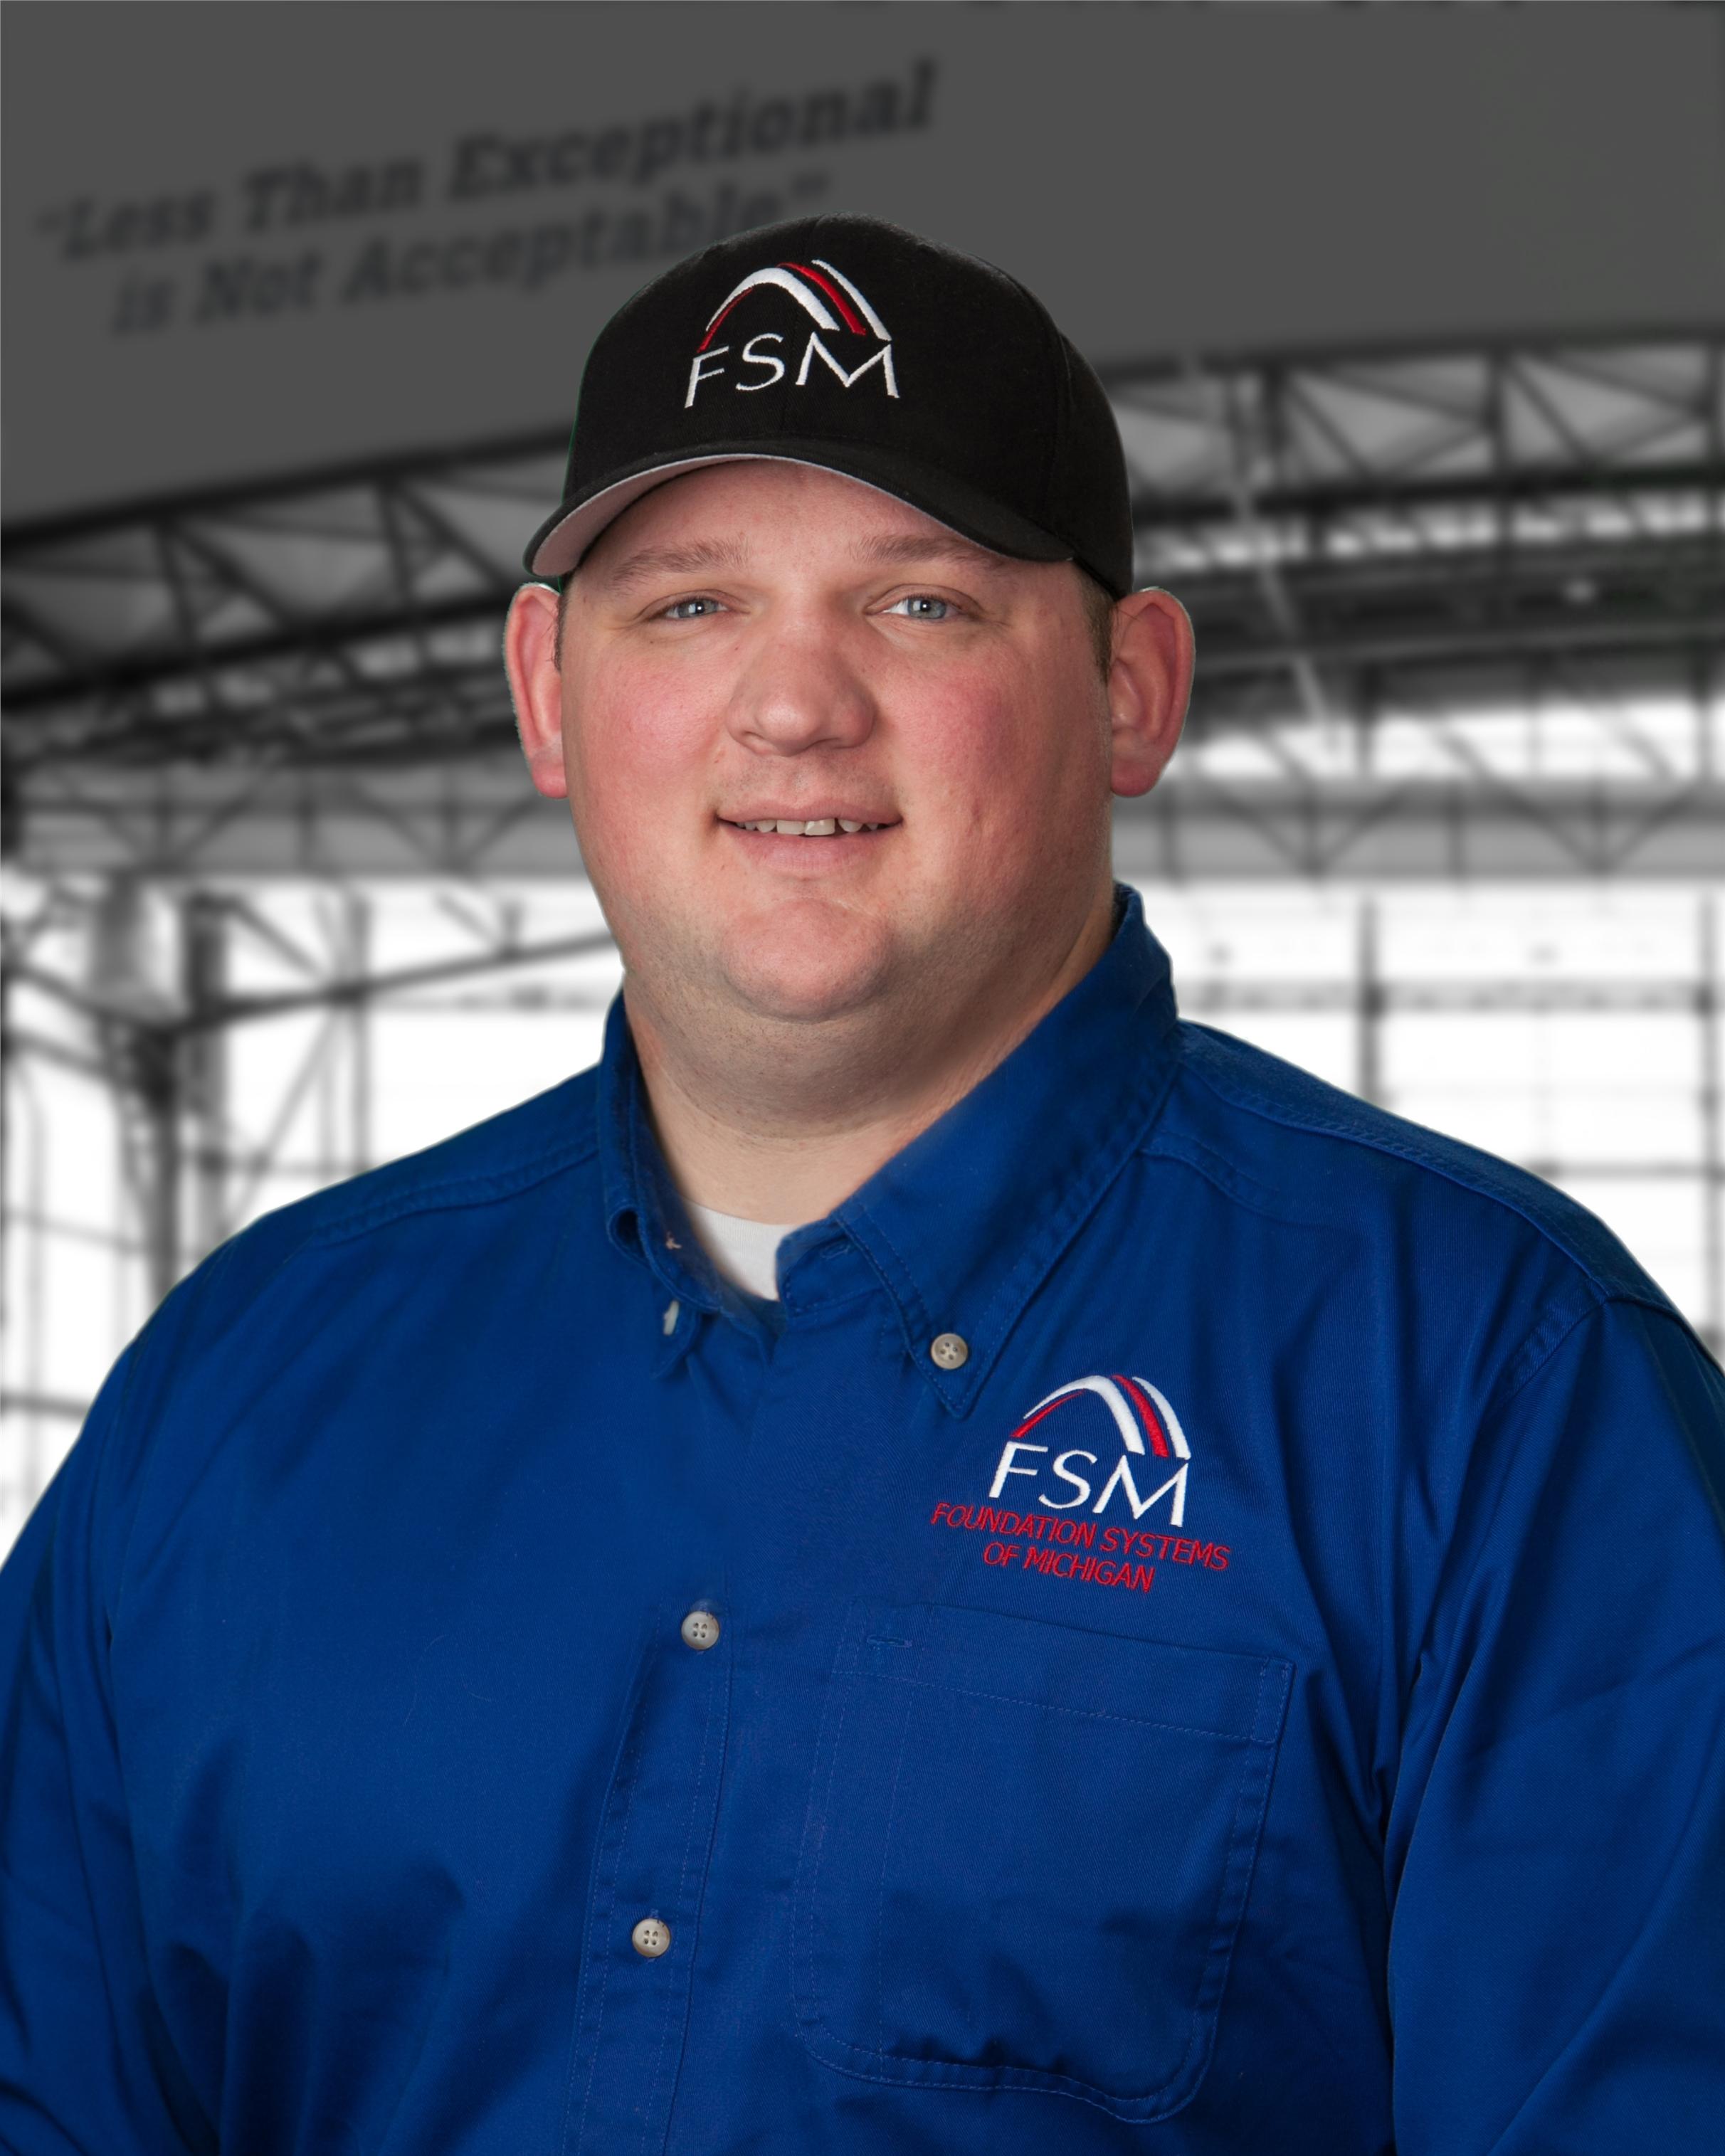 FSM Michael Vipond Installation Manager